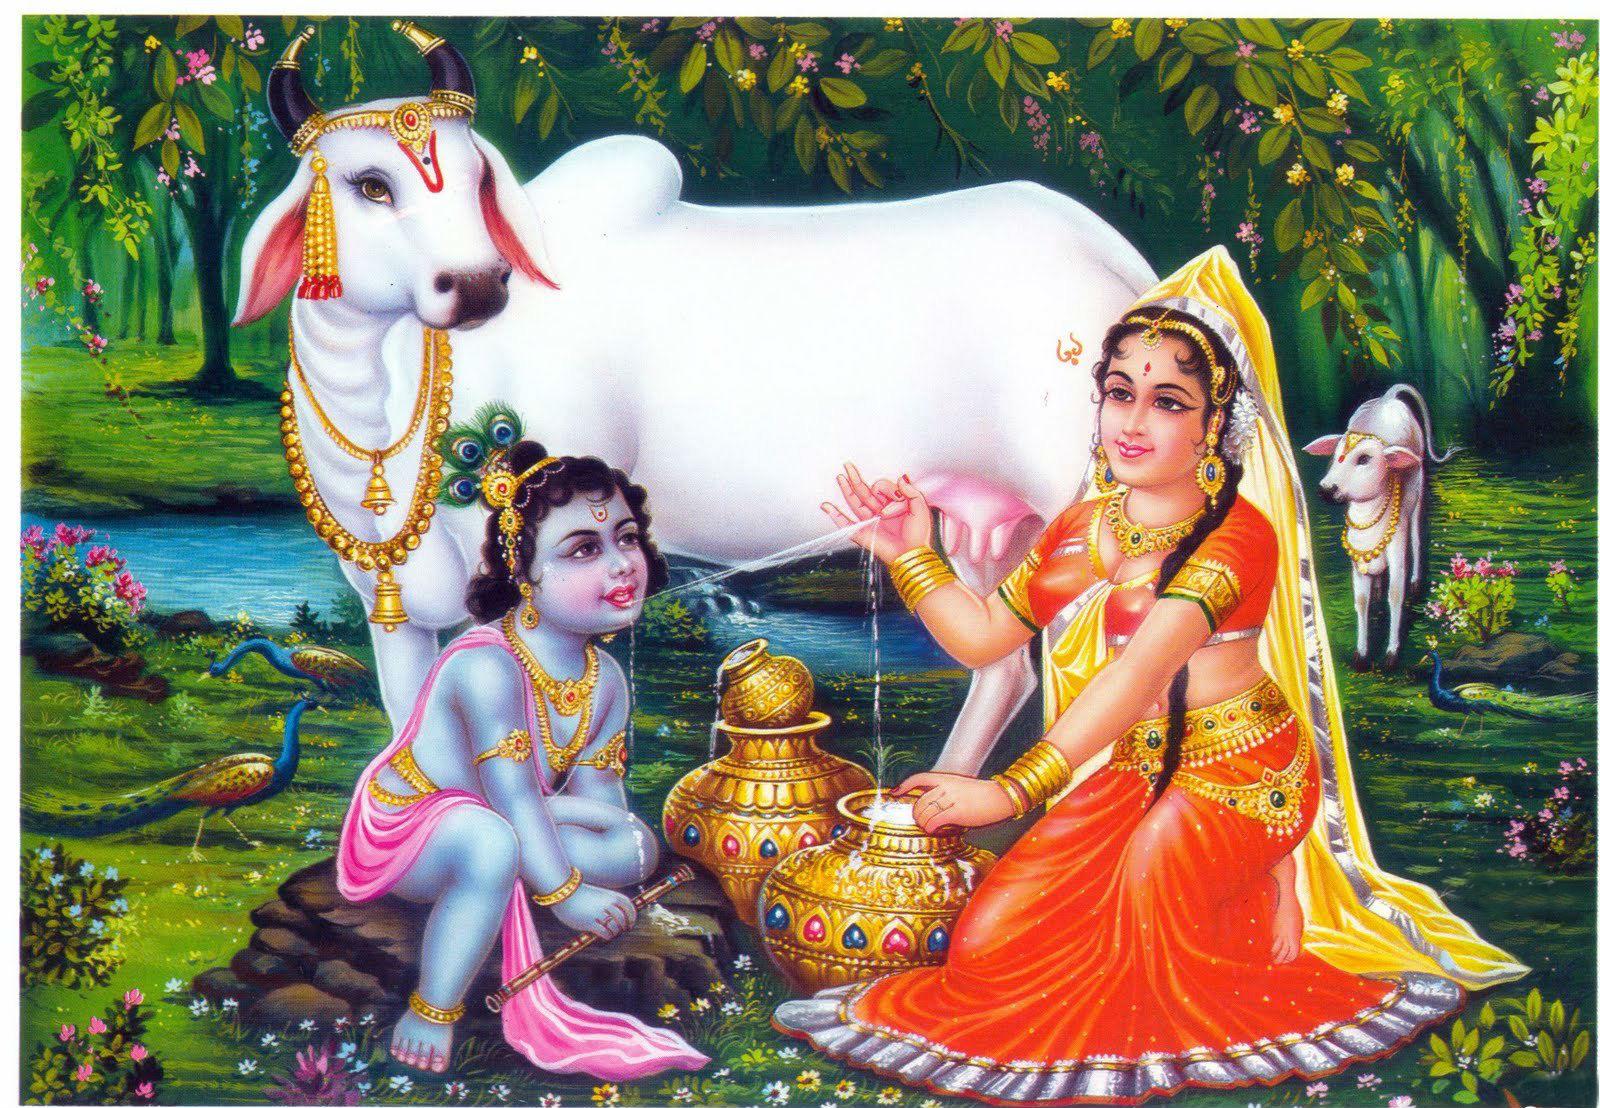 Ganesh Bhagwan Hd Wallpaper Picture Collection Krishna Yashoda Super Hd Wallpaper